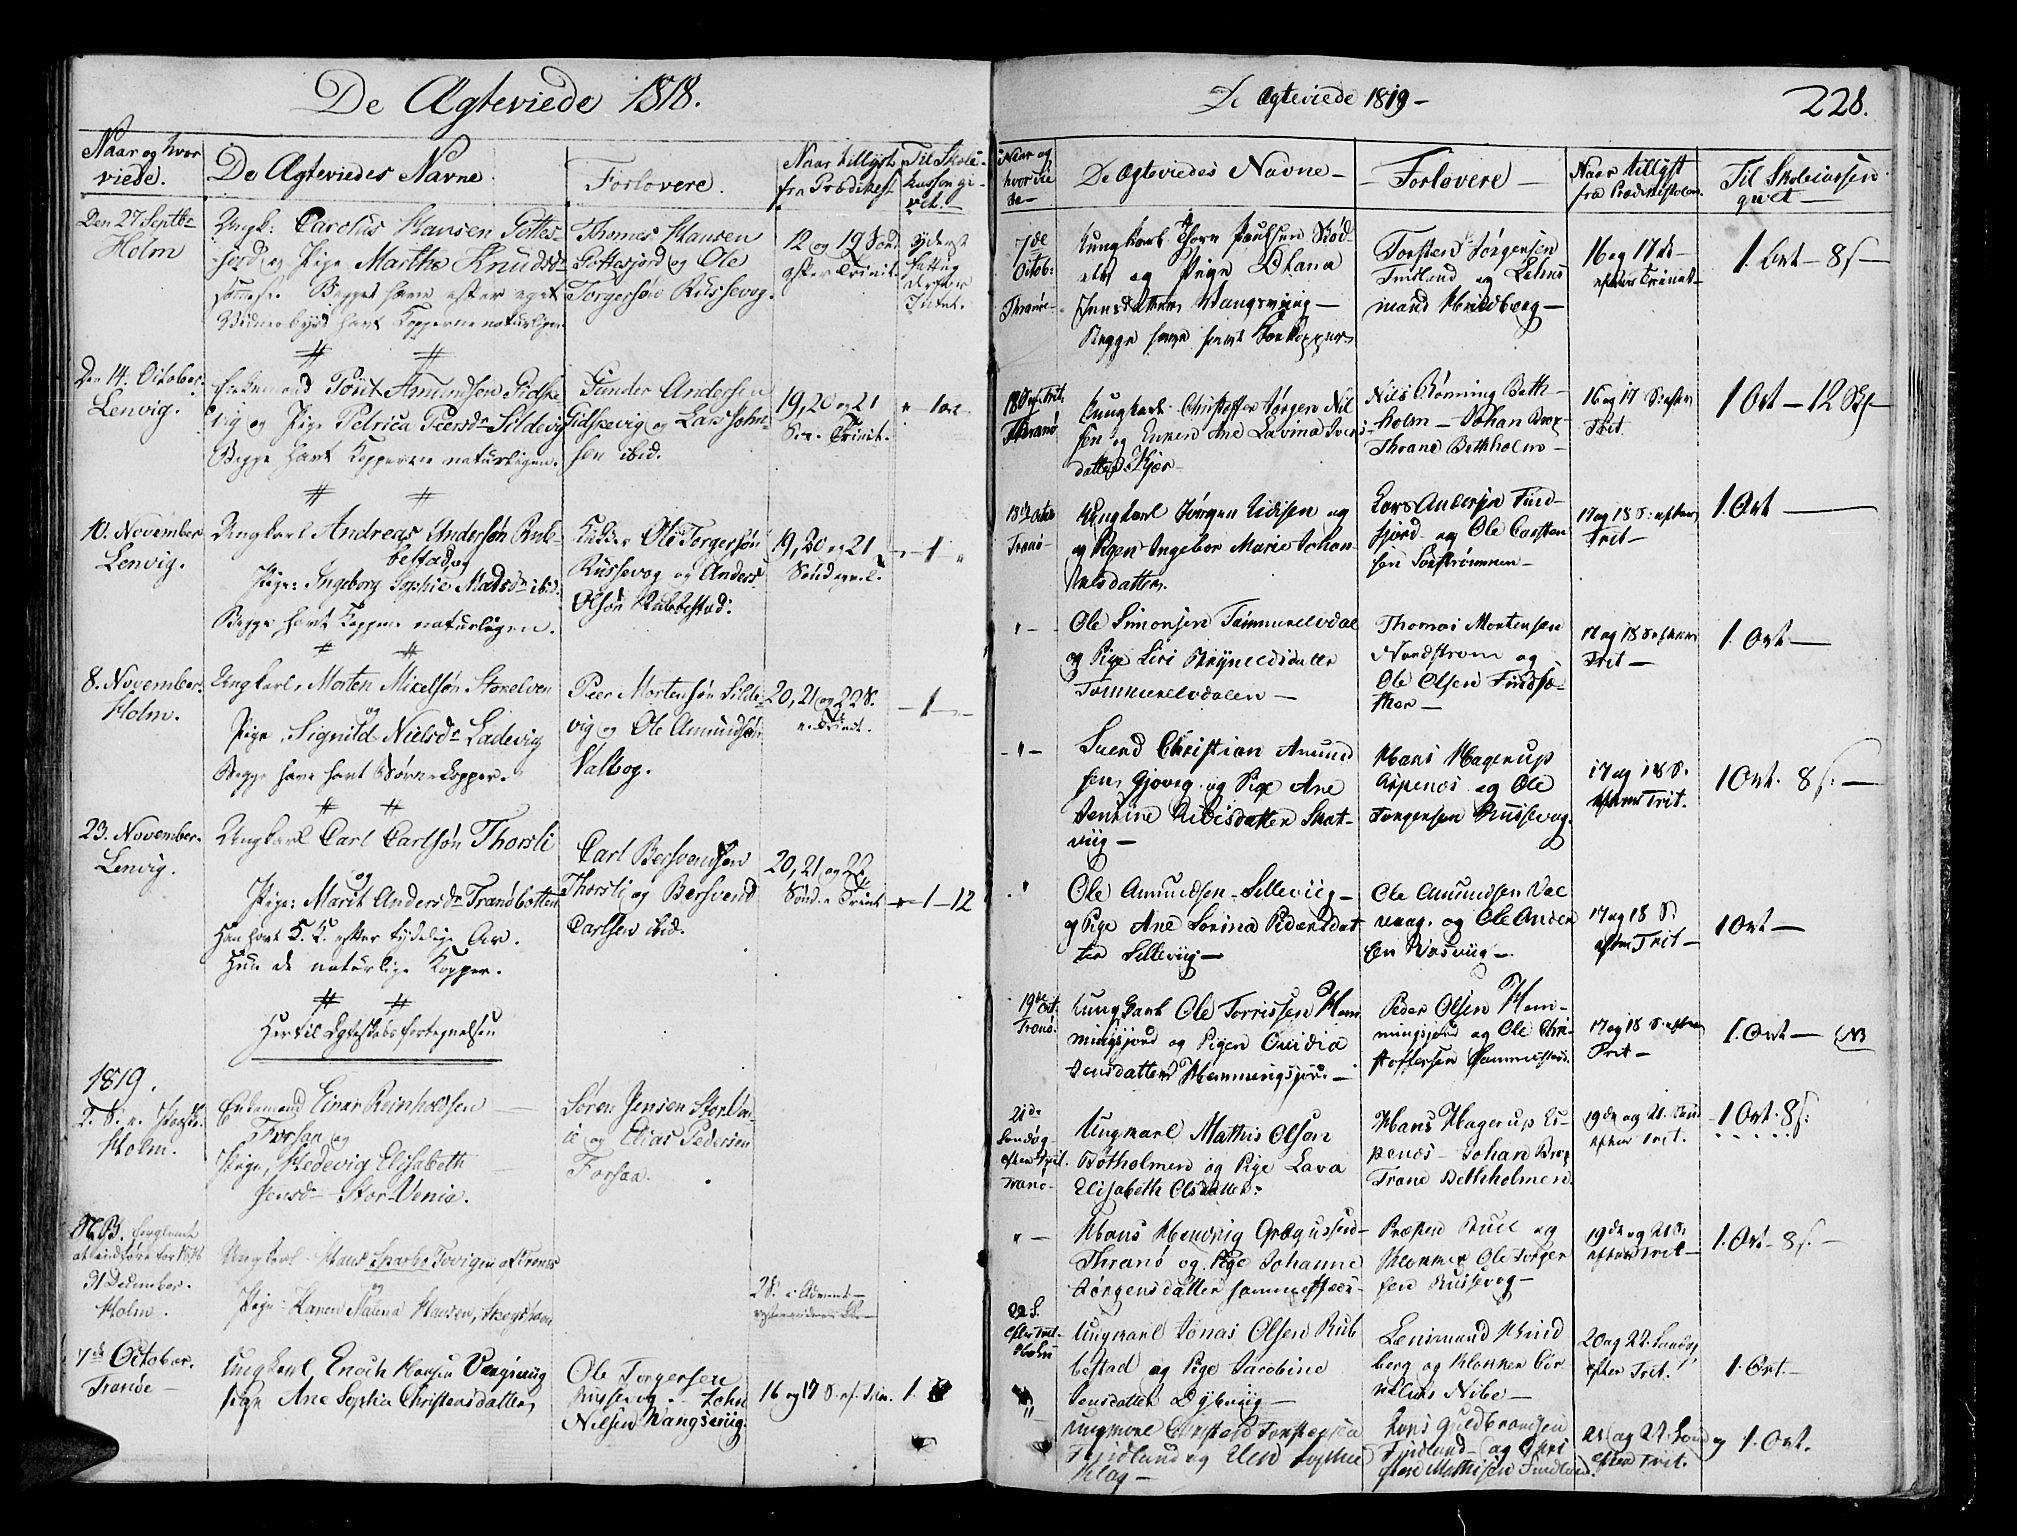 SATØ, Tranøy sokneprestkontor, I/Ia/Iaa/L0003kirke: Ministerialbok nr. 3, 1807-1820, s. 228